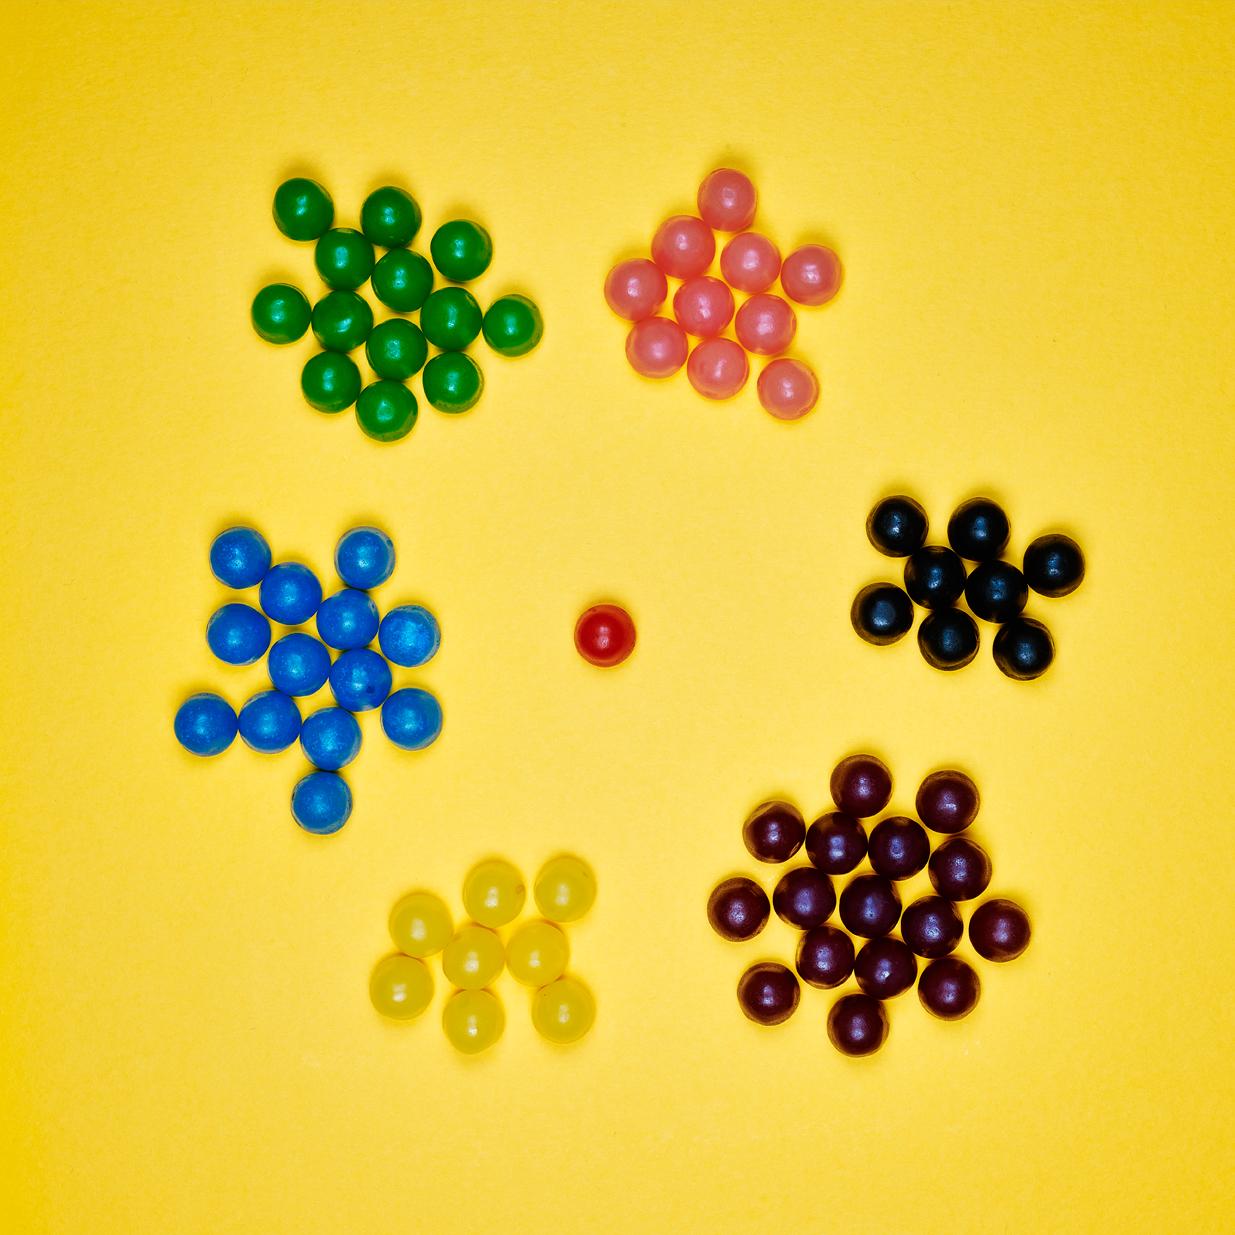 Dragibus Soft:  Purple 23.18% / Blue 18.84% / Green 18.84% / Pink 14.94% / Black 11.59% / Yellow 11.59% / Red 1.44%. (1 x 300g)